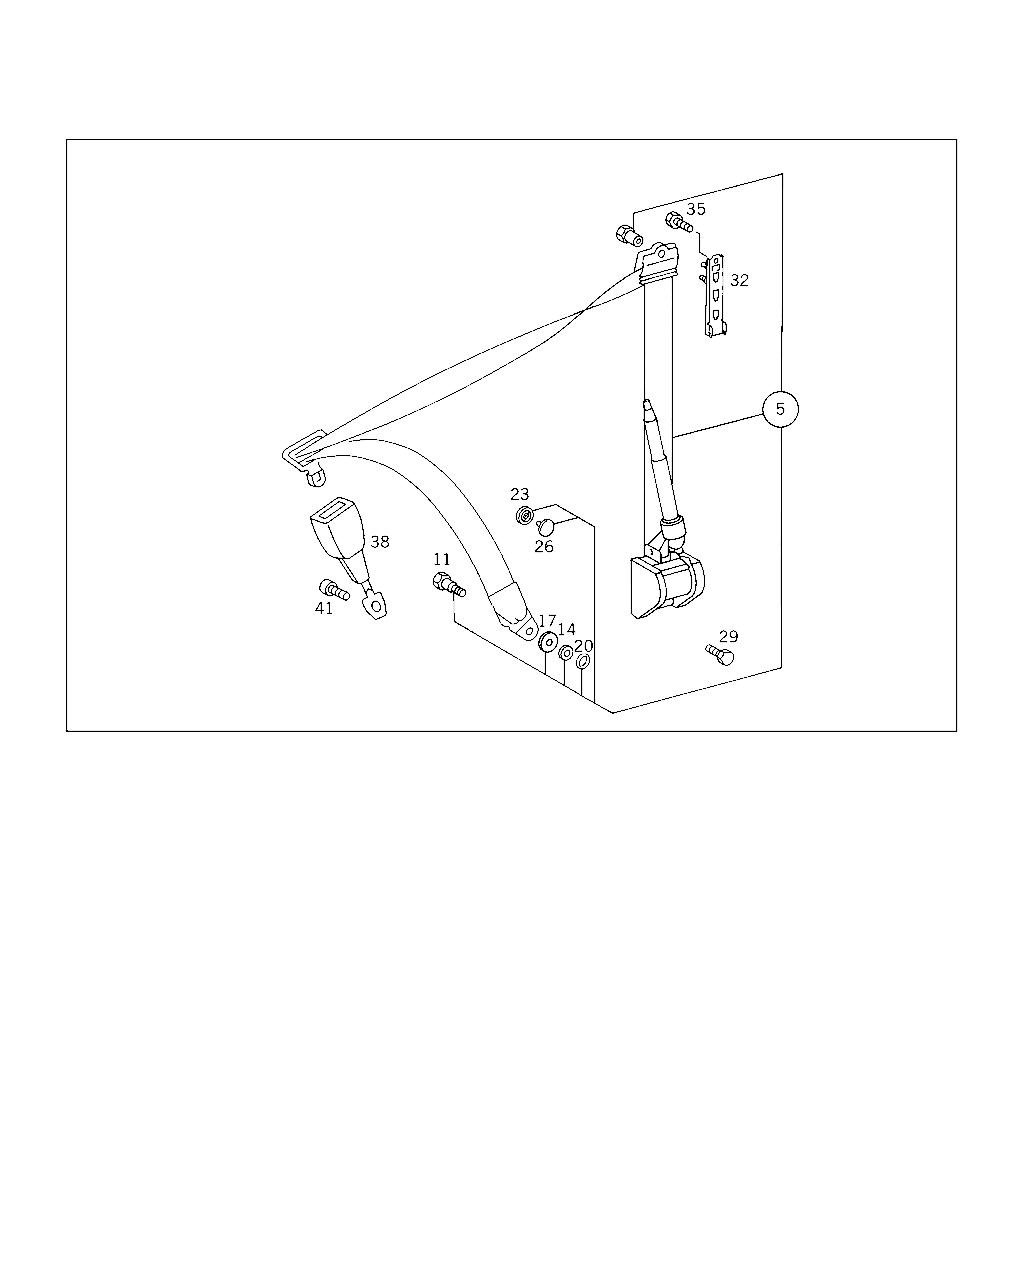 207827362 2009 2010 dodge journey parts manual